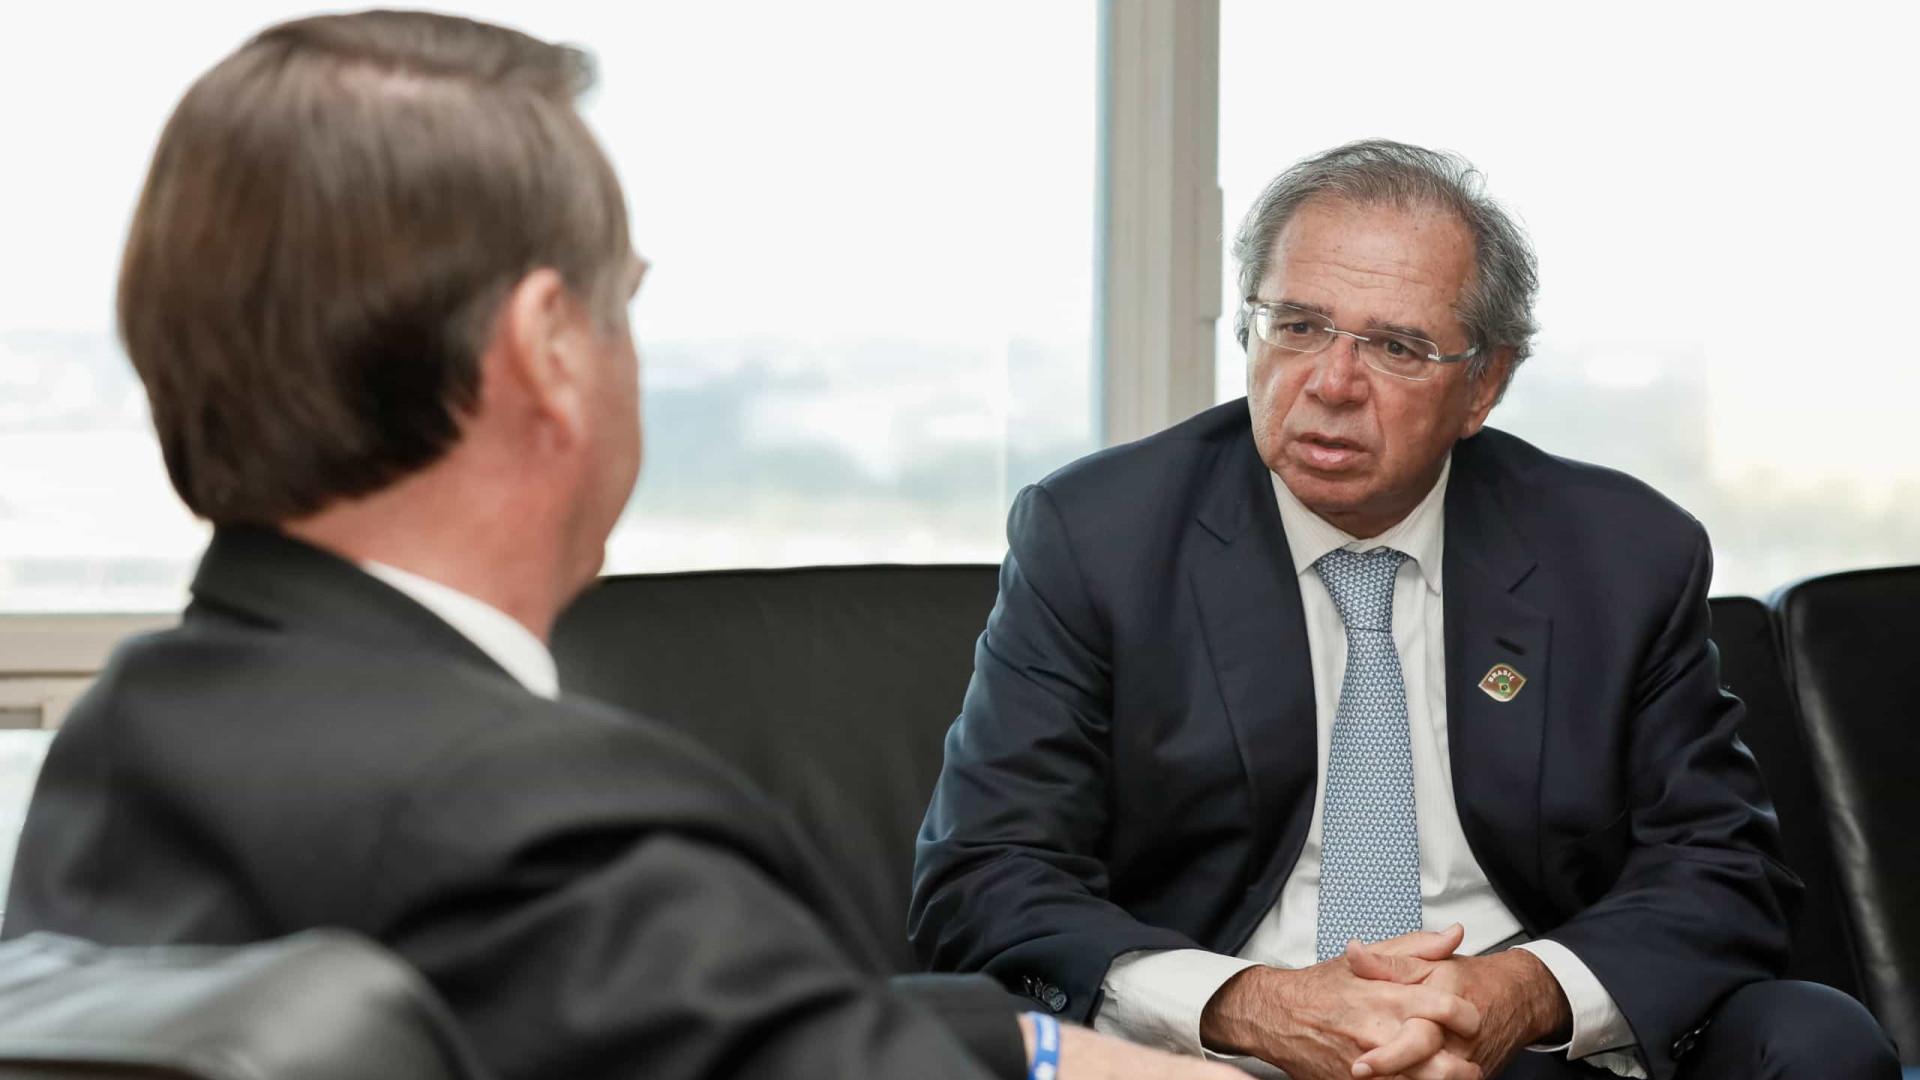 Reforma vai excluir juízes e parlamentares